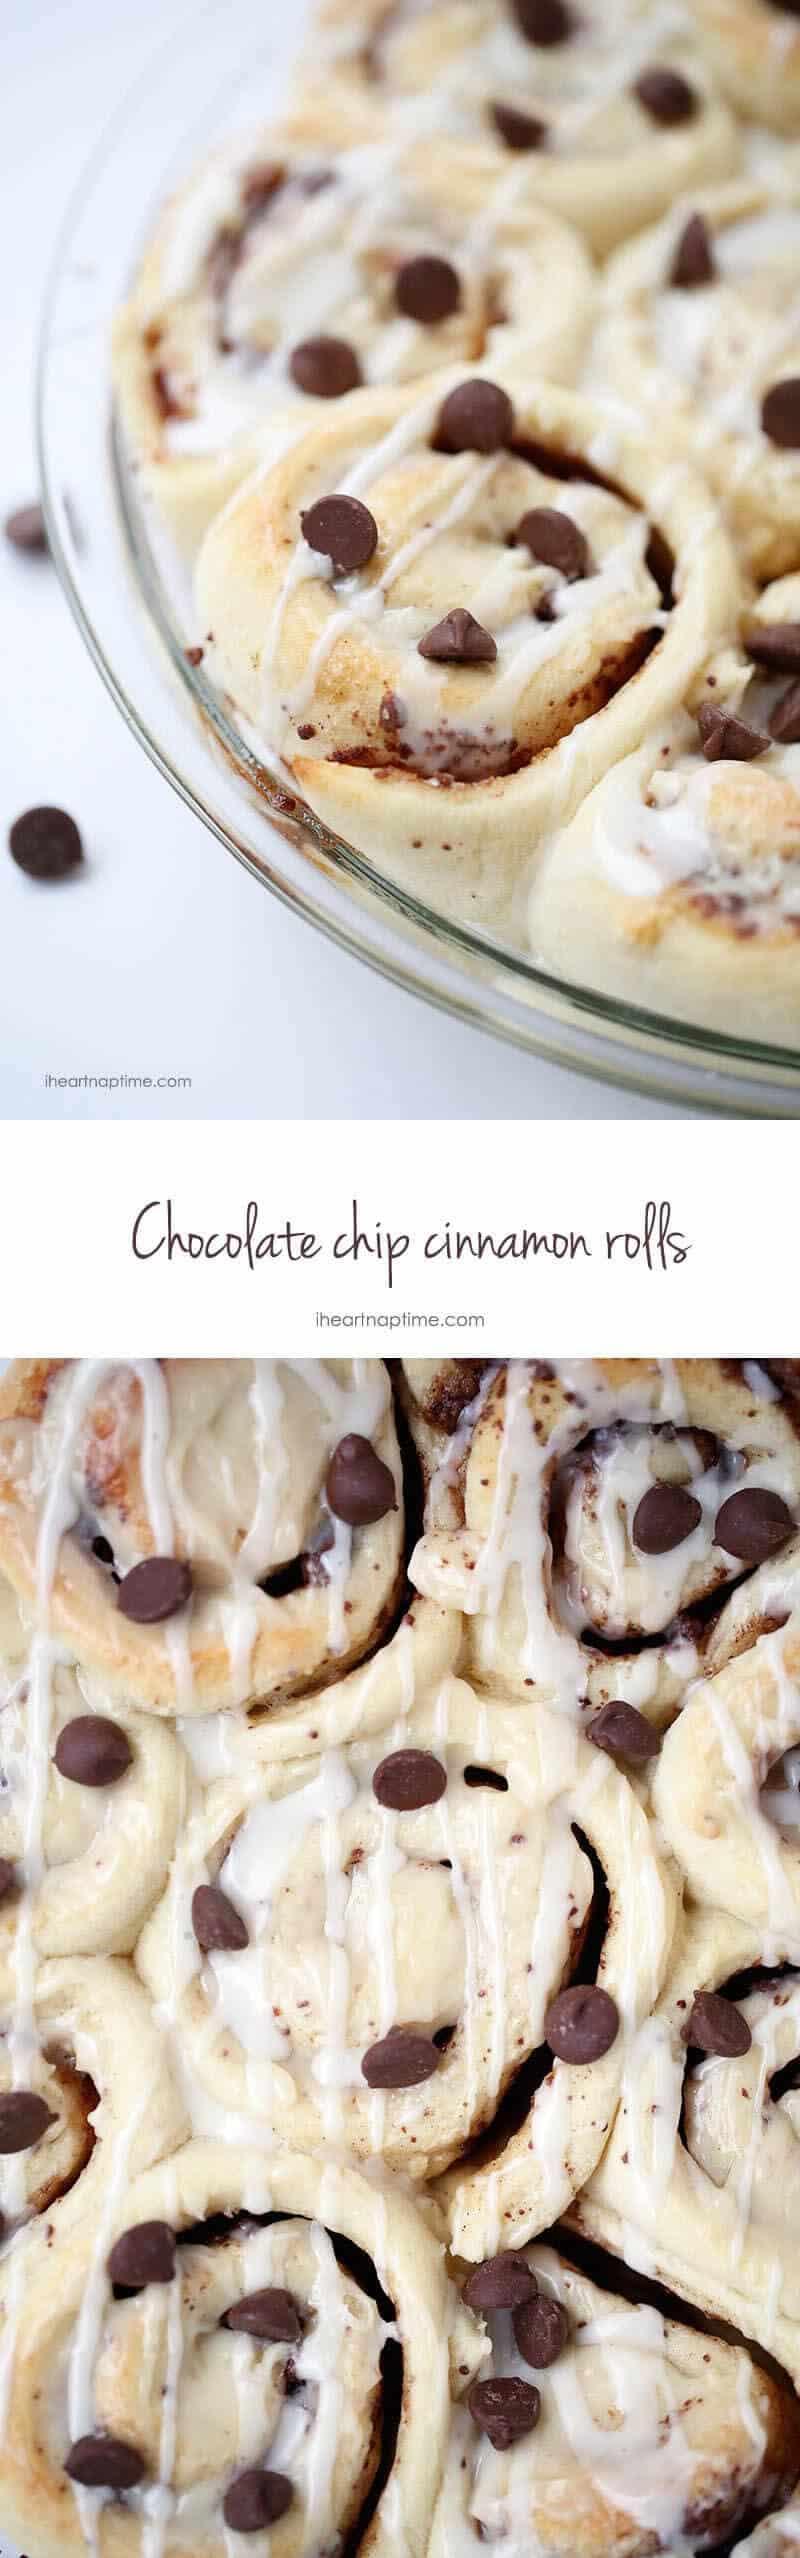 Chocolate chip cinnamon rolls